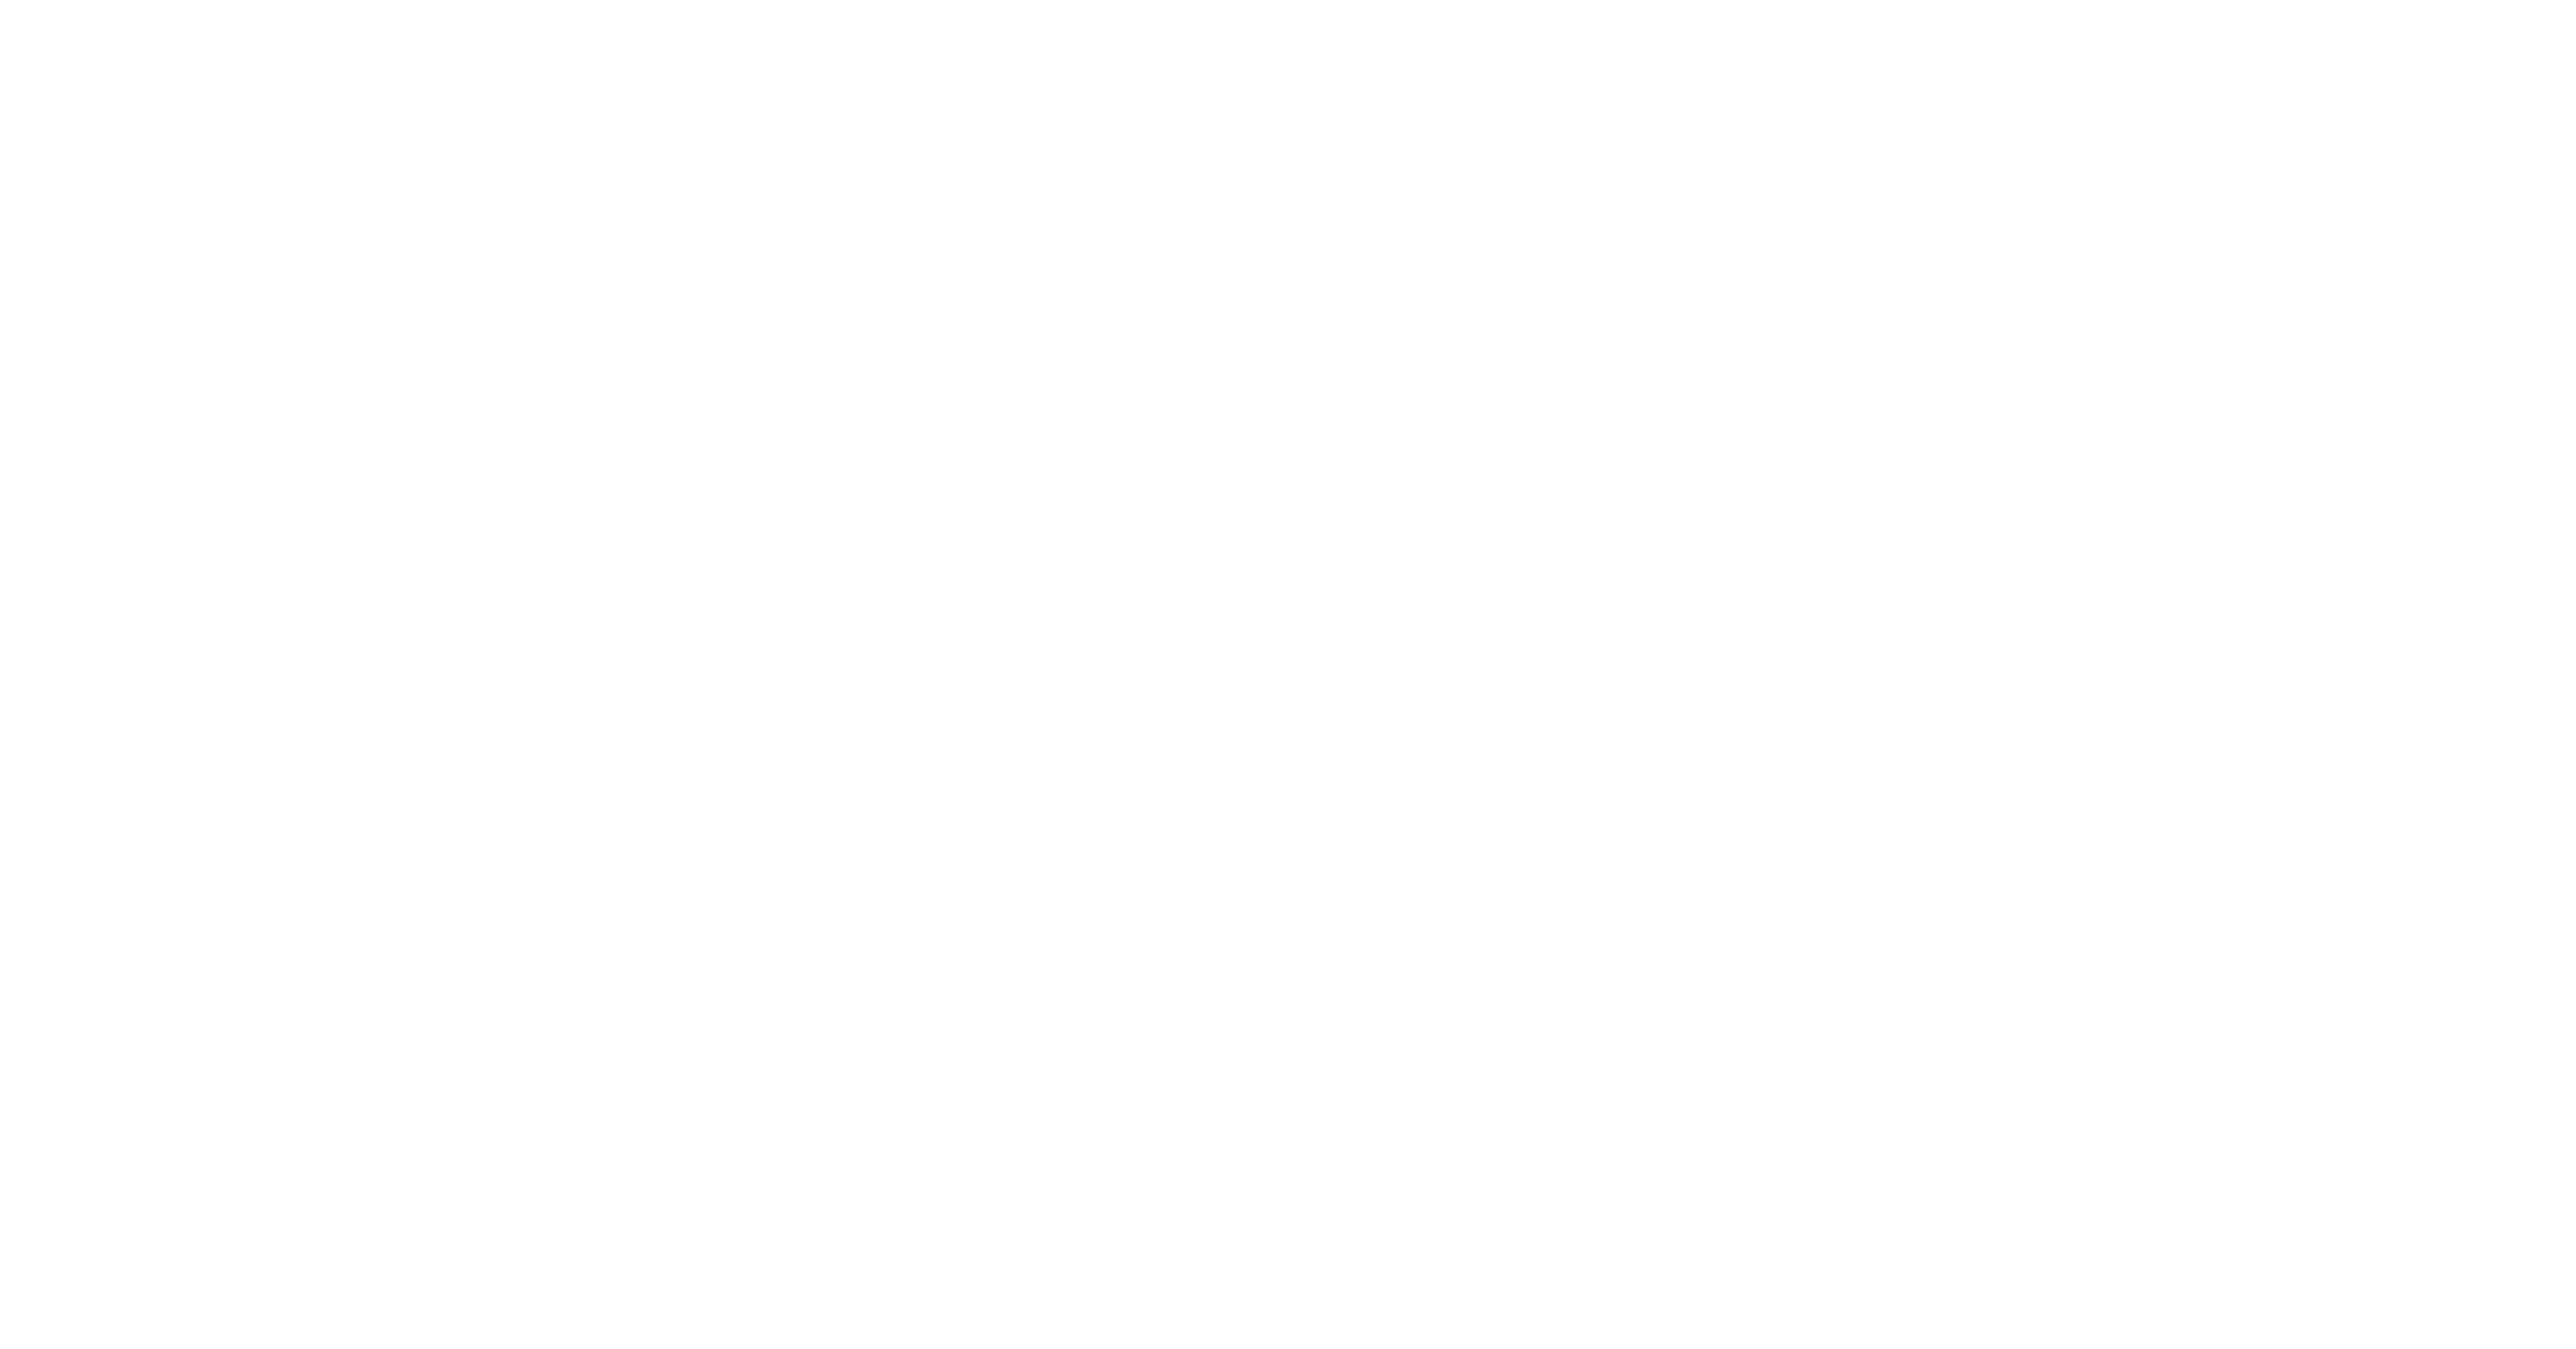 FITAMI.cz